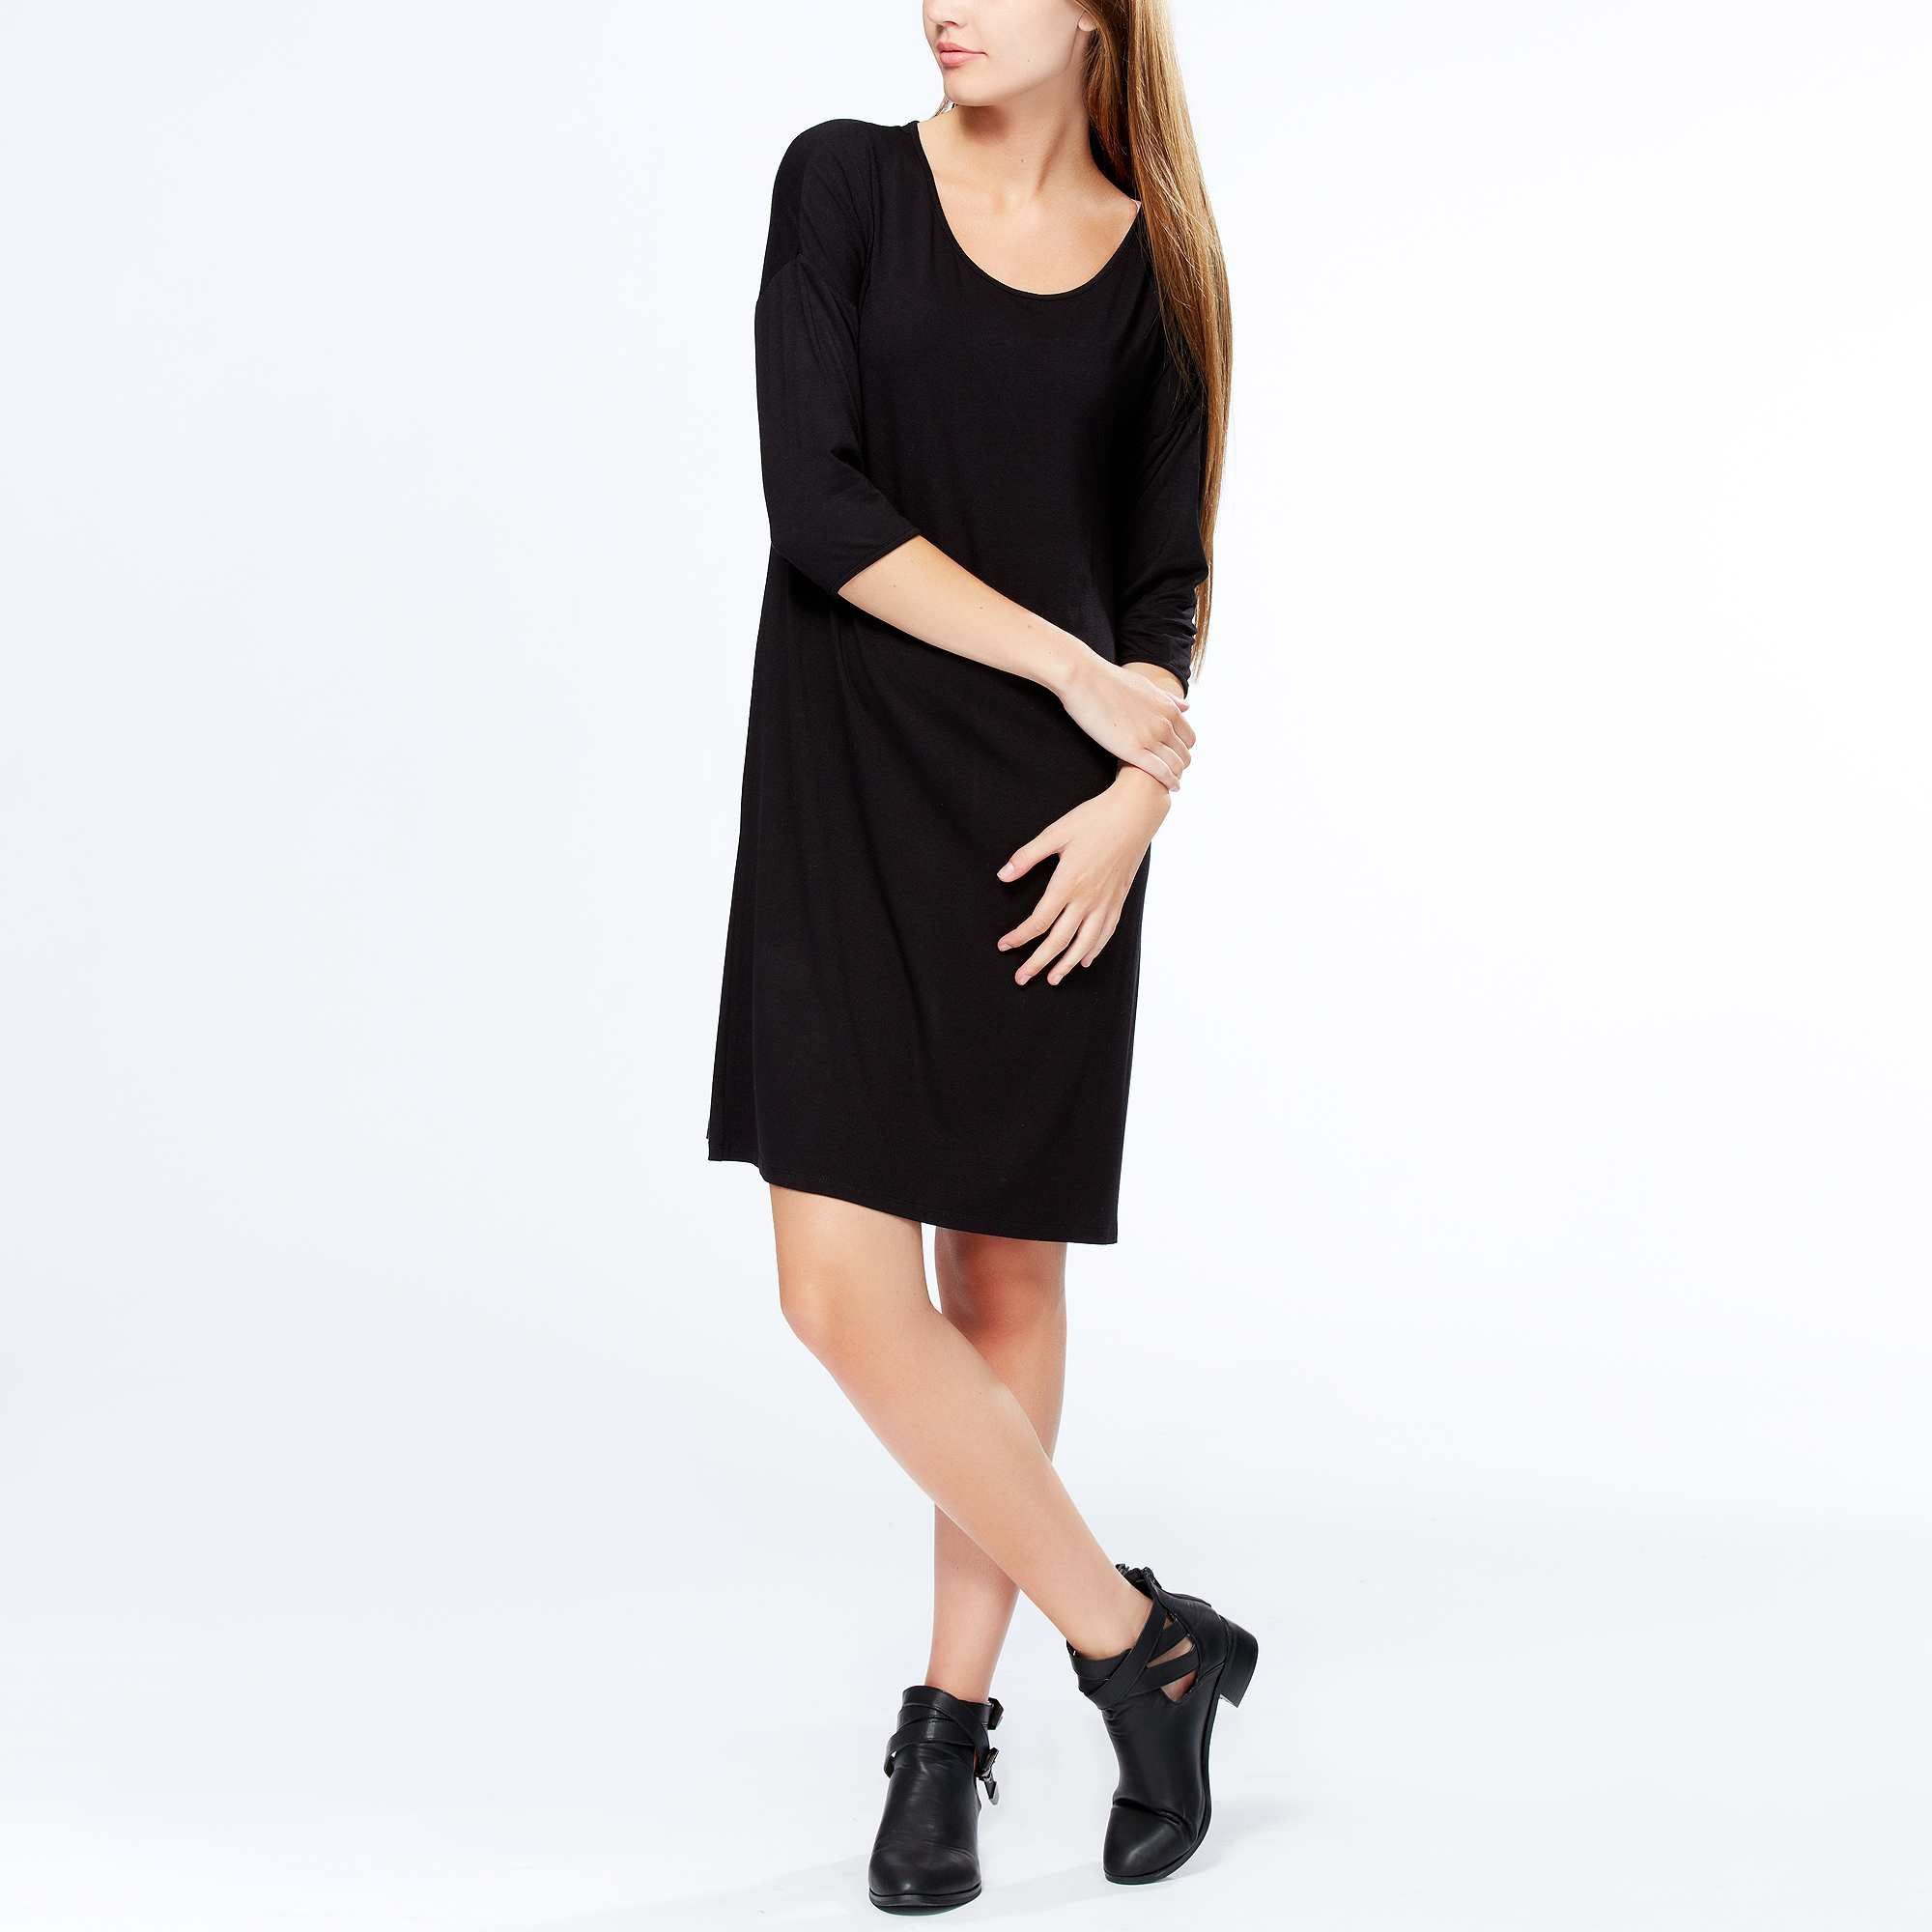 Robe noire fluide femme